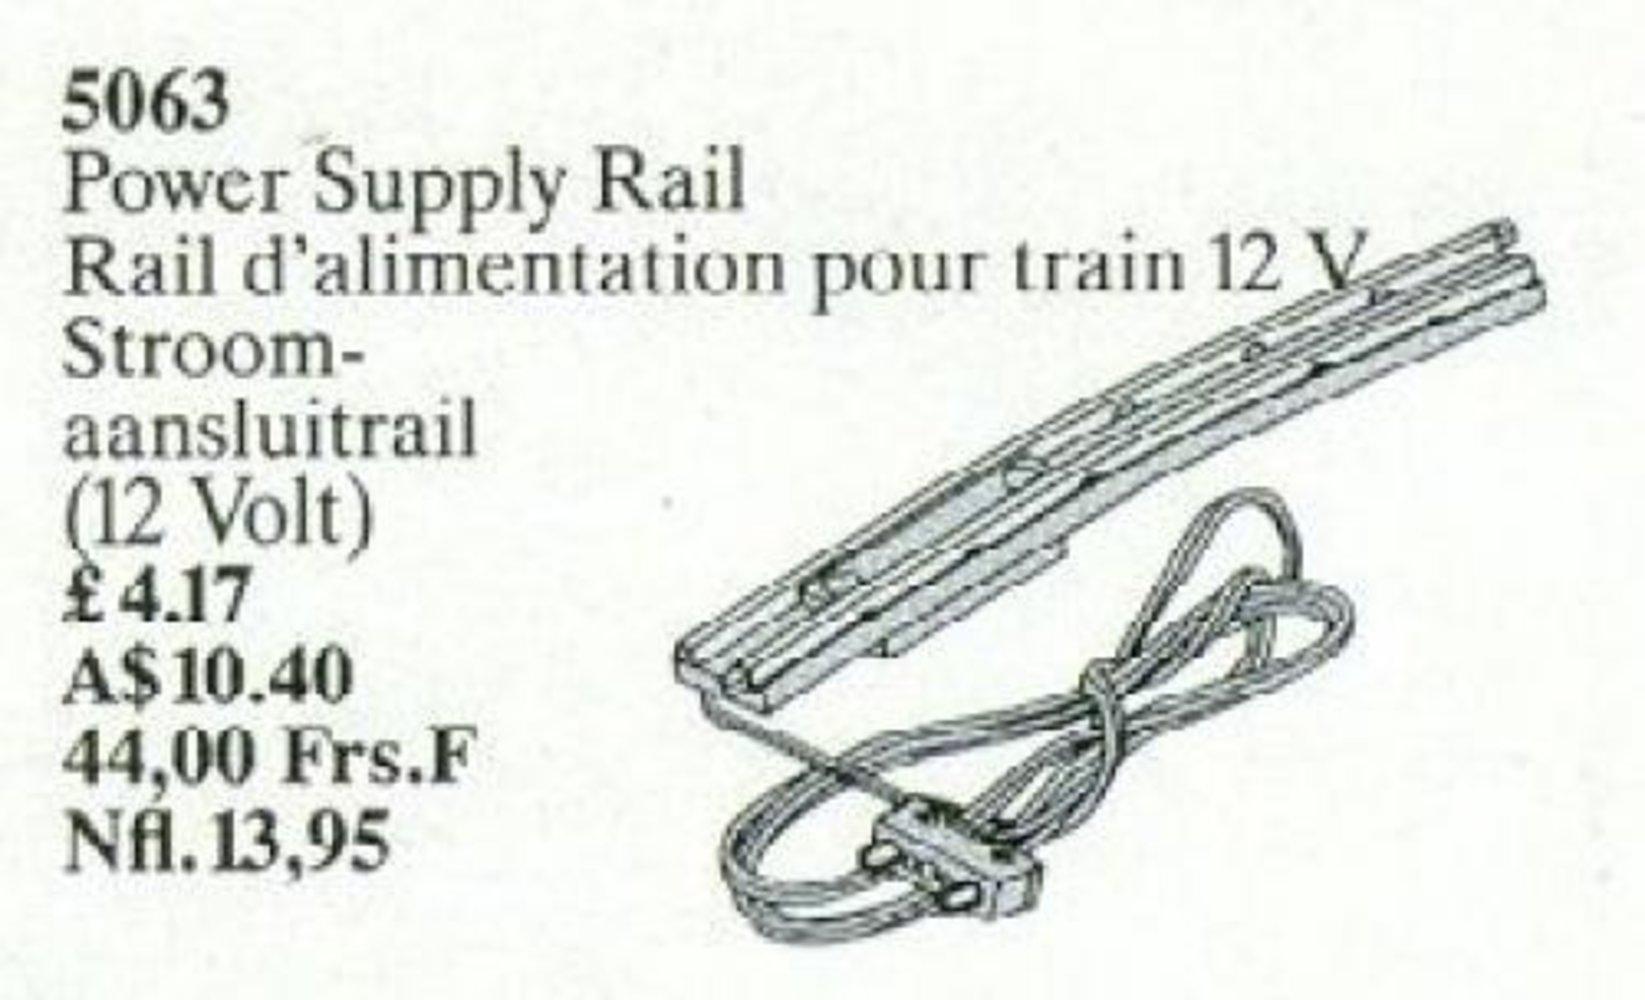 Power Supply Rail